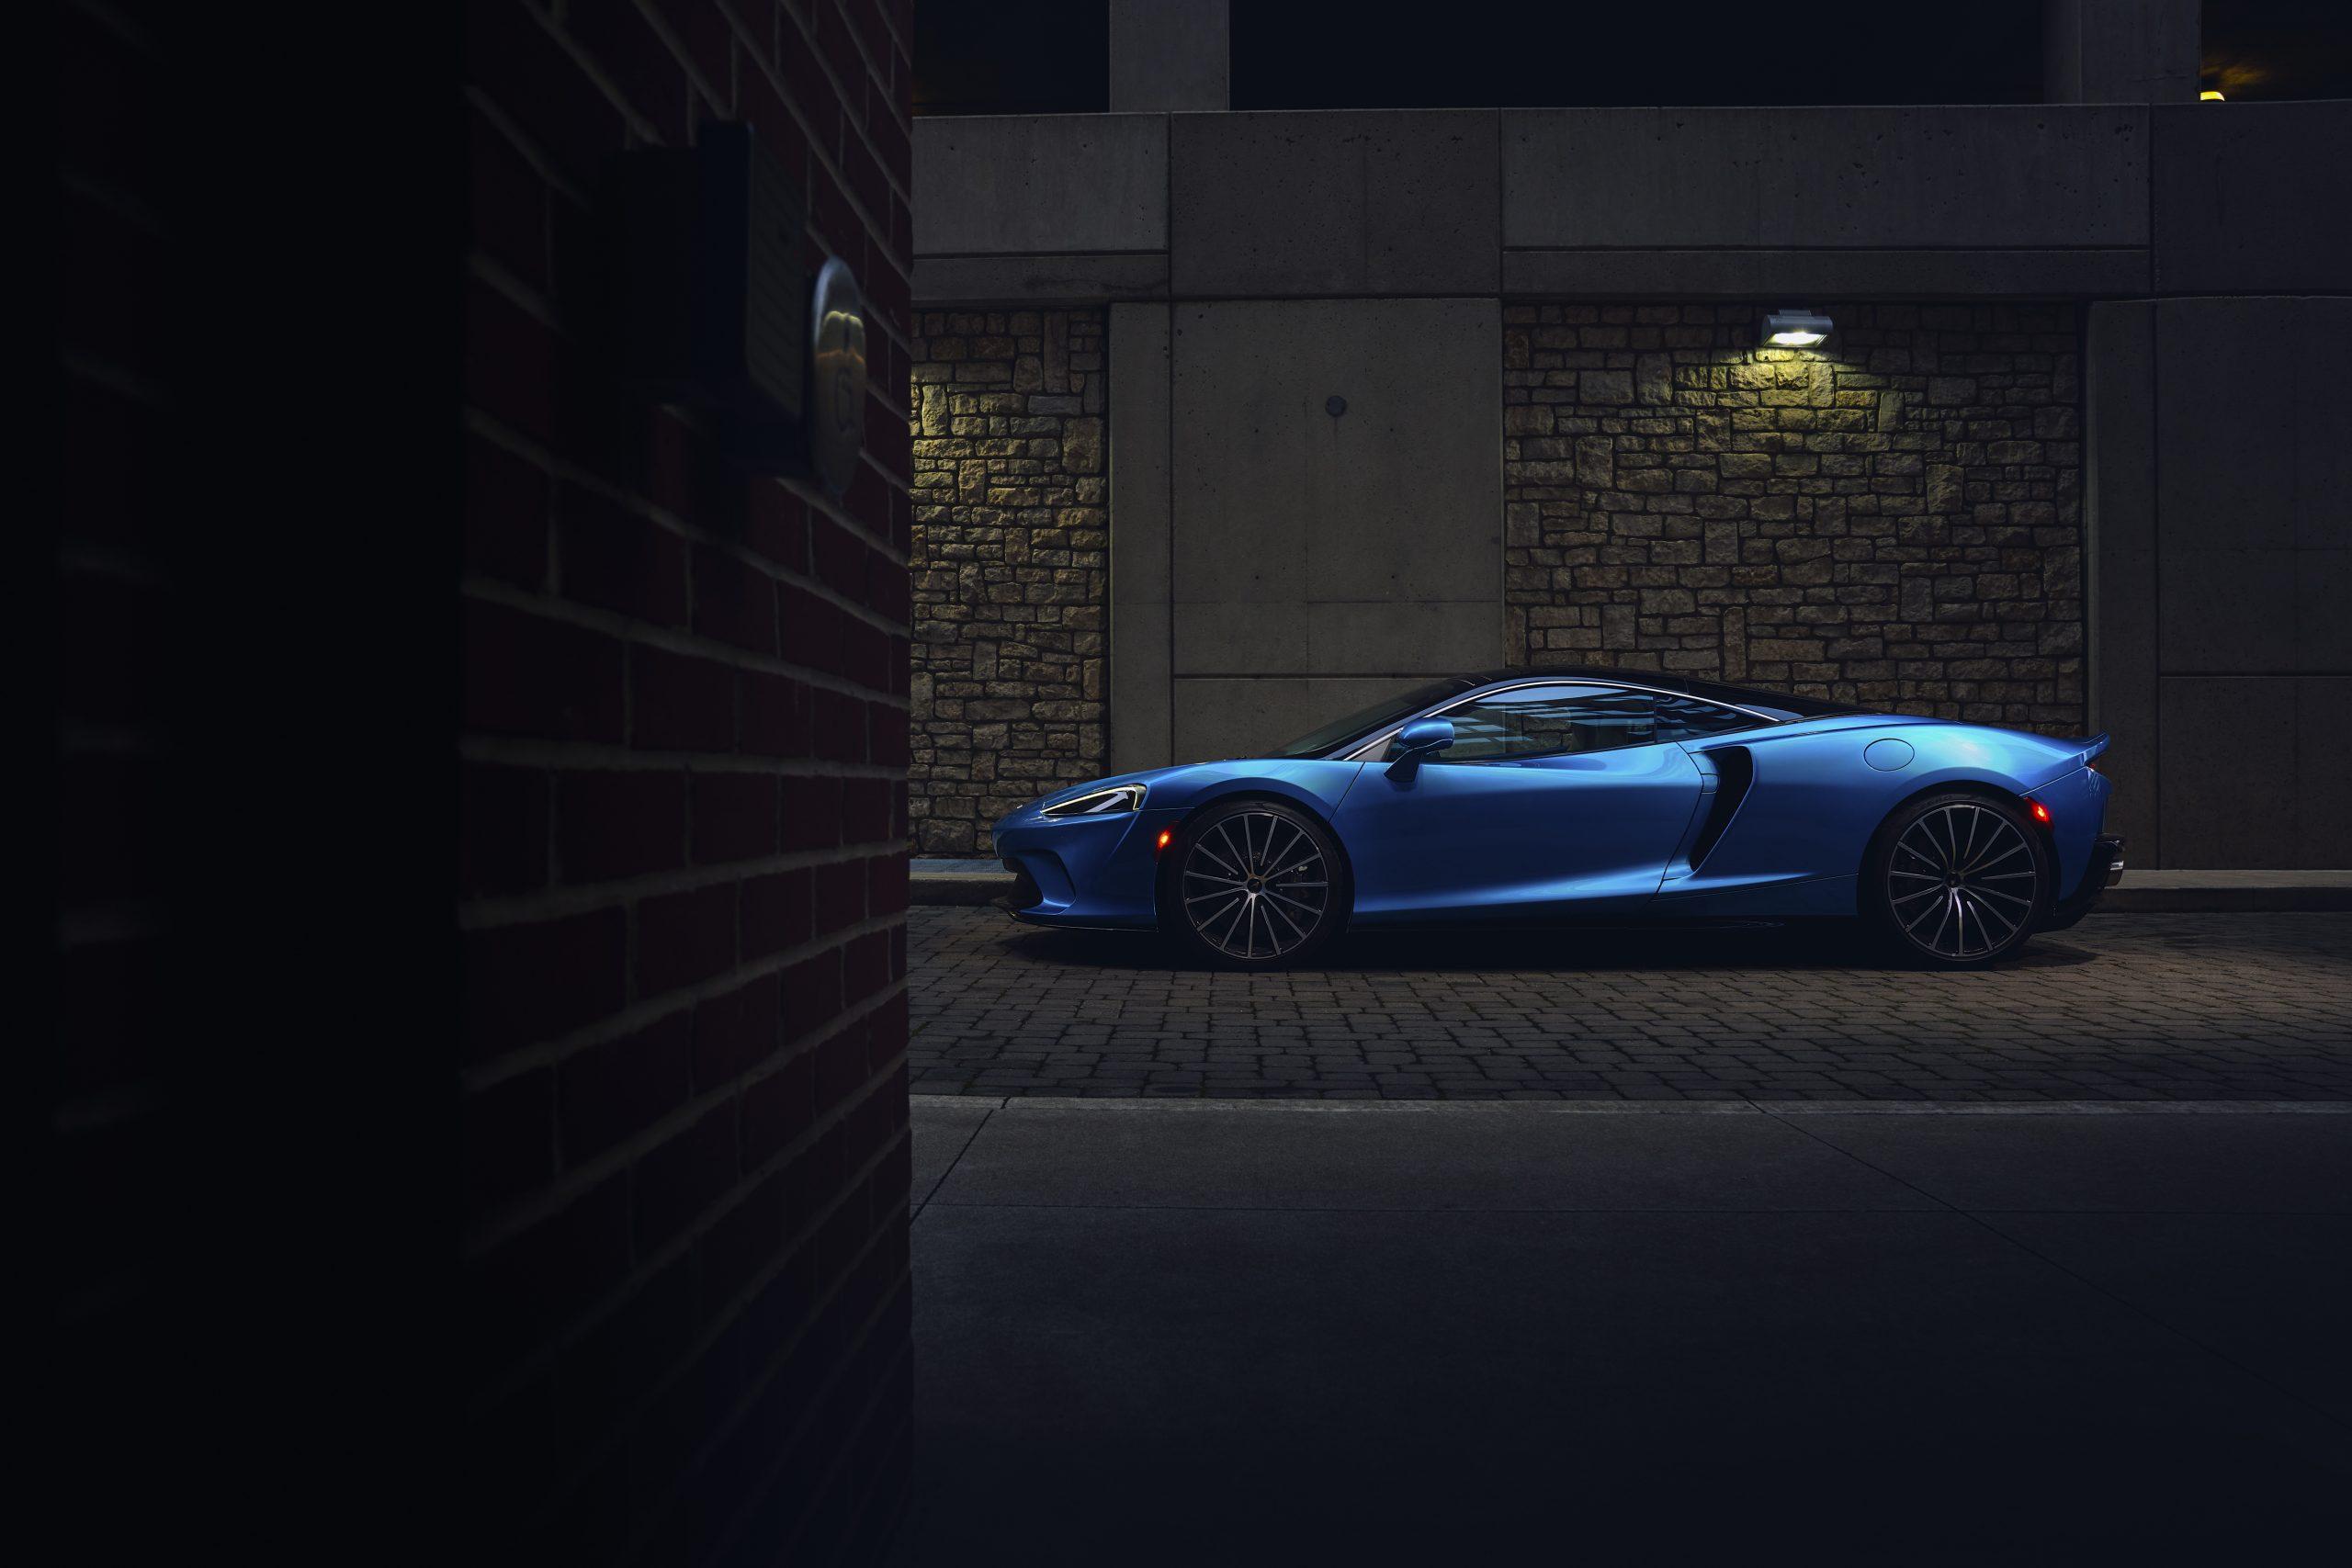 2020-McLaren-GT_Trahan_0680 profile